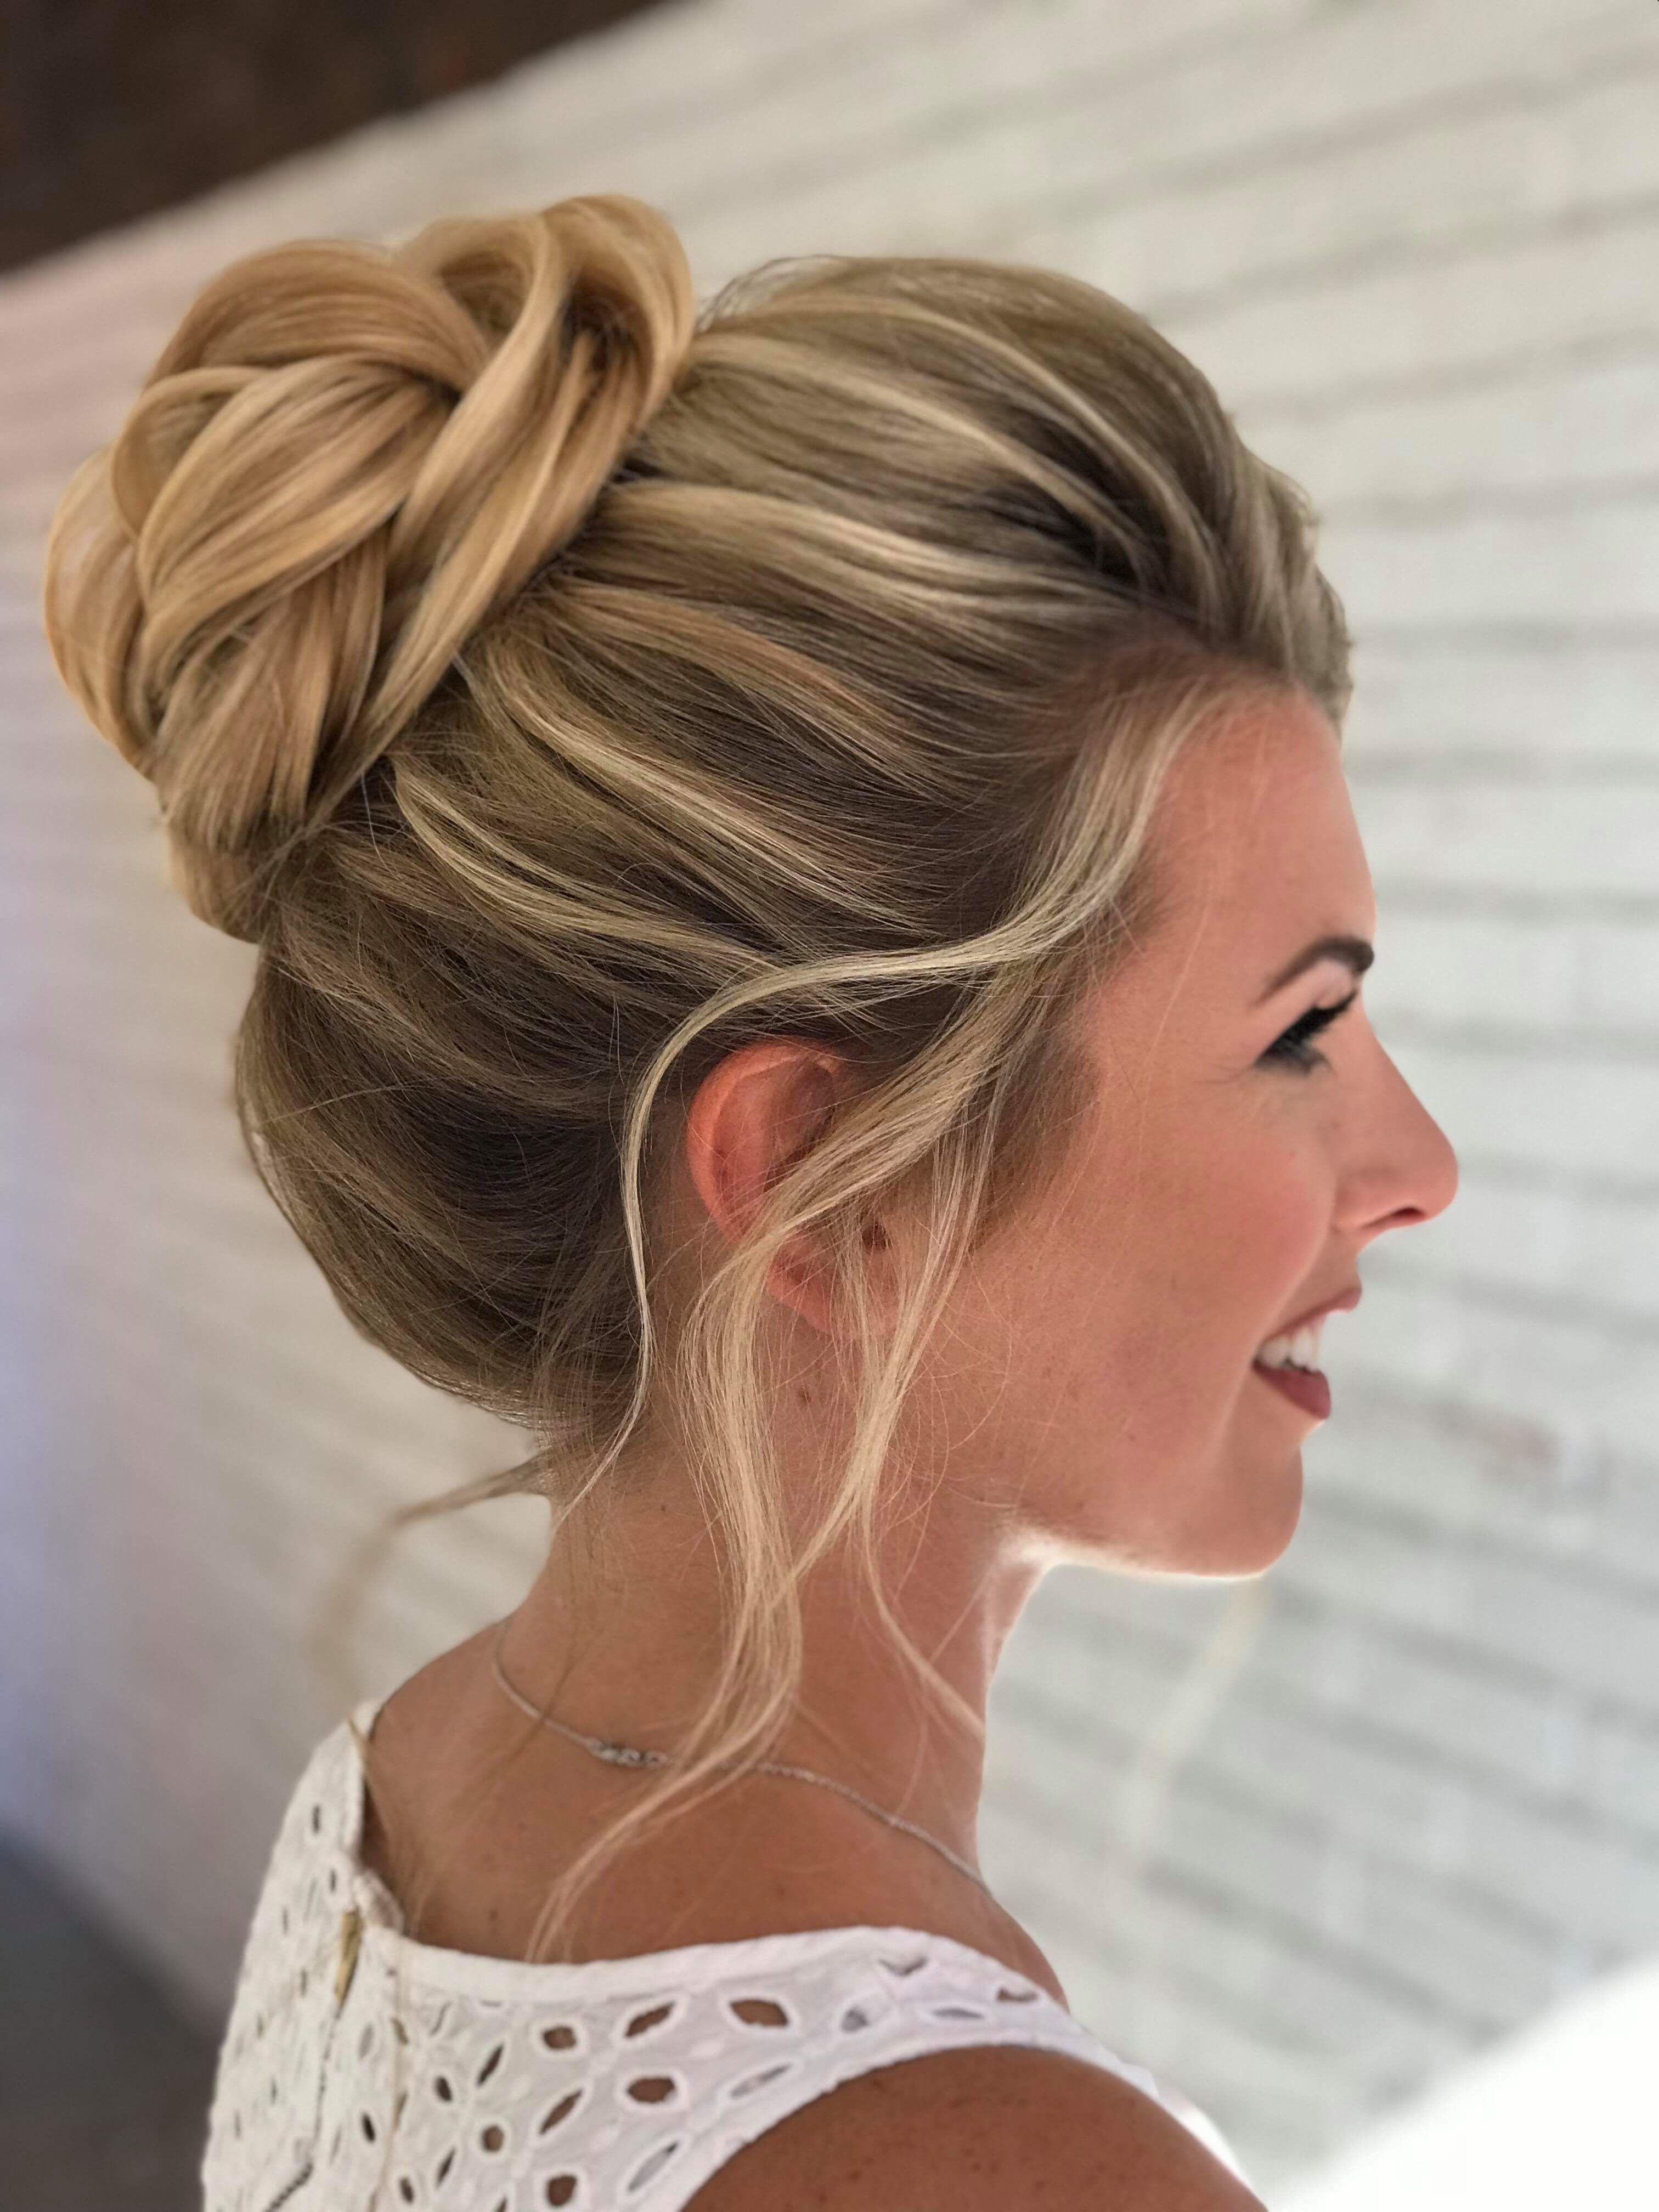 Wedding Hairstyle High Bun On Highlighted Blonde Hair Bridesmaid Hair Bun High Bun Hairstyles Bridesmaid Hair Updo